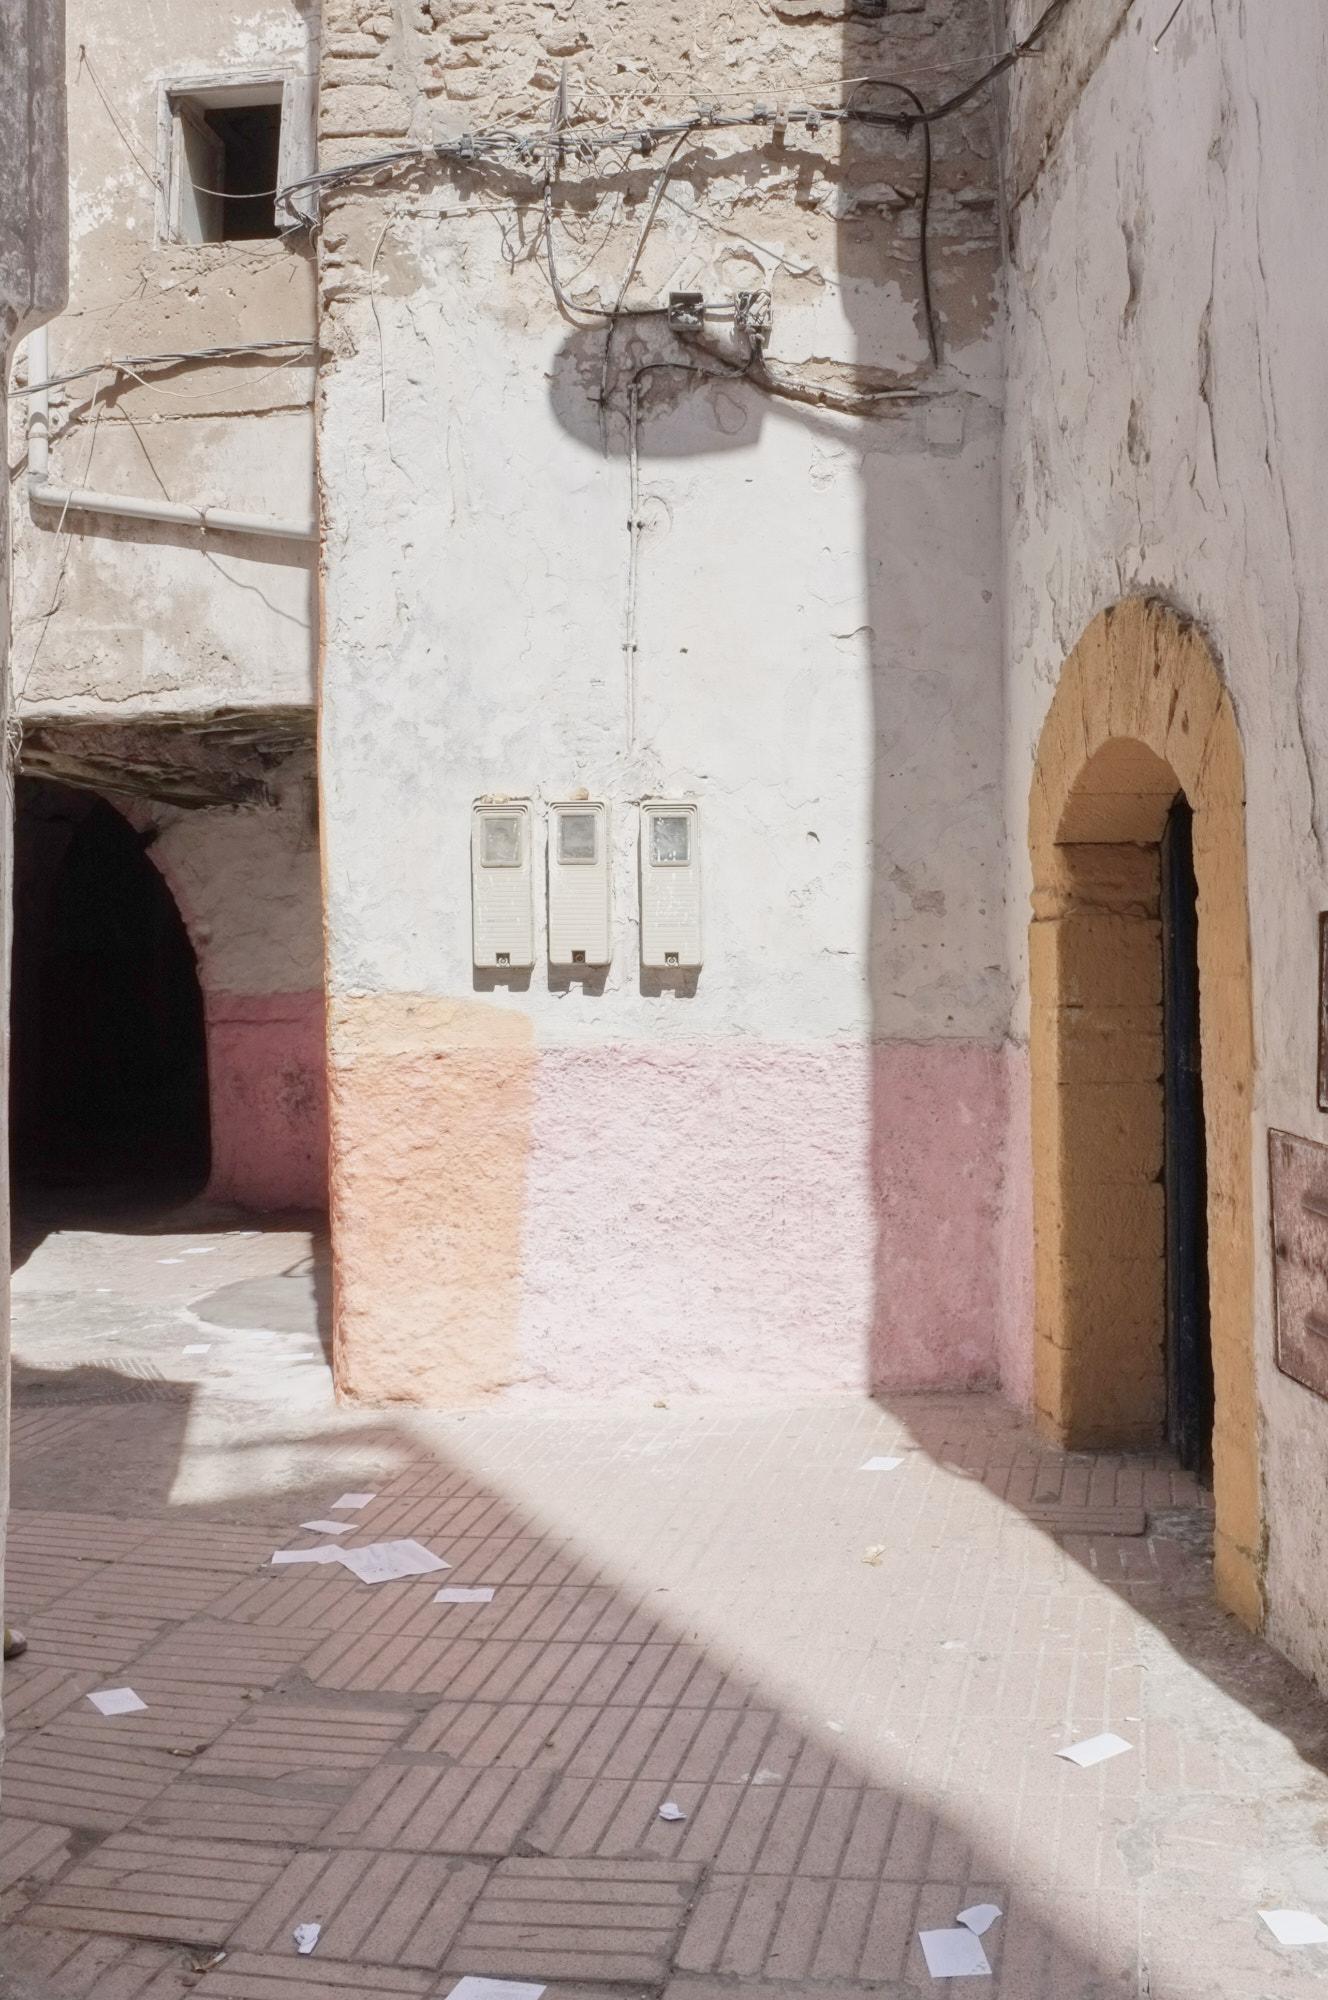 SMCLEOD_Morocco_2016_09_19